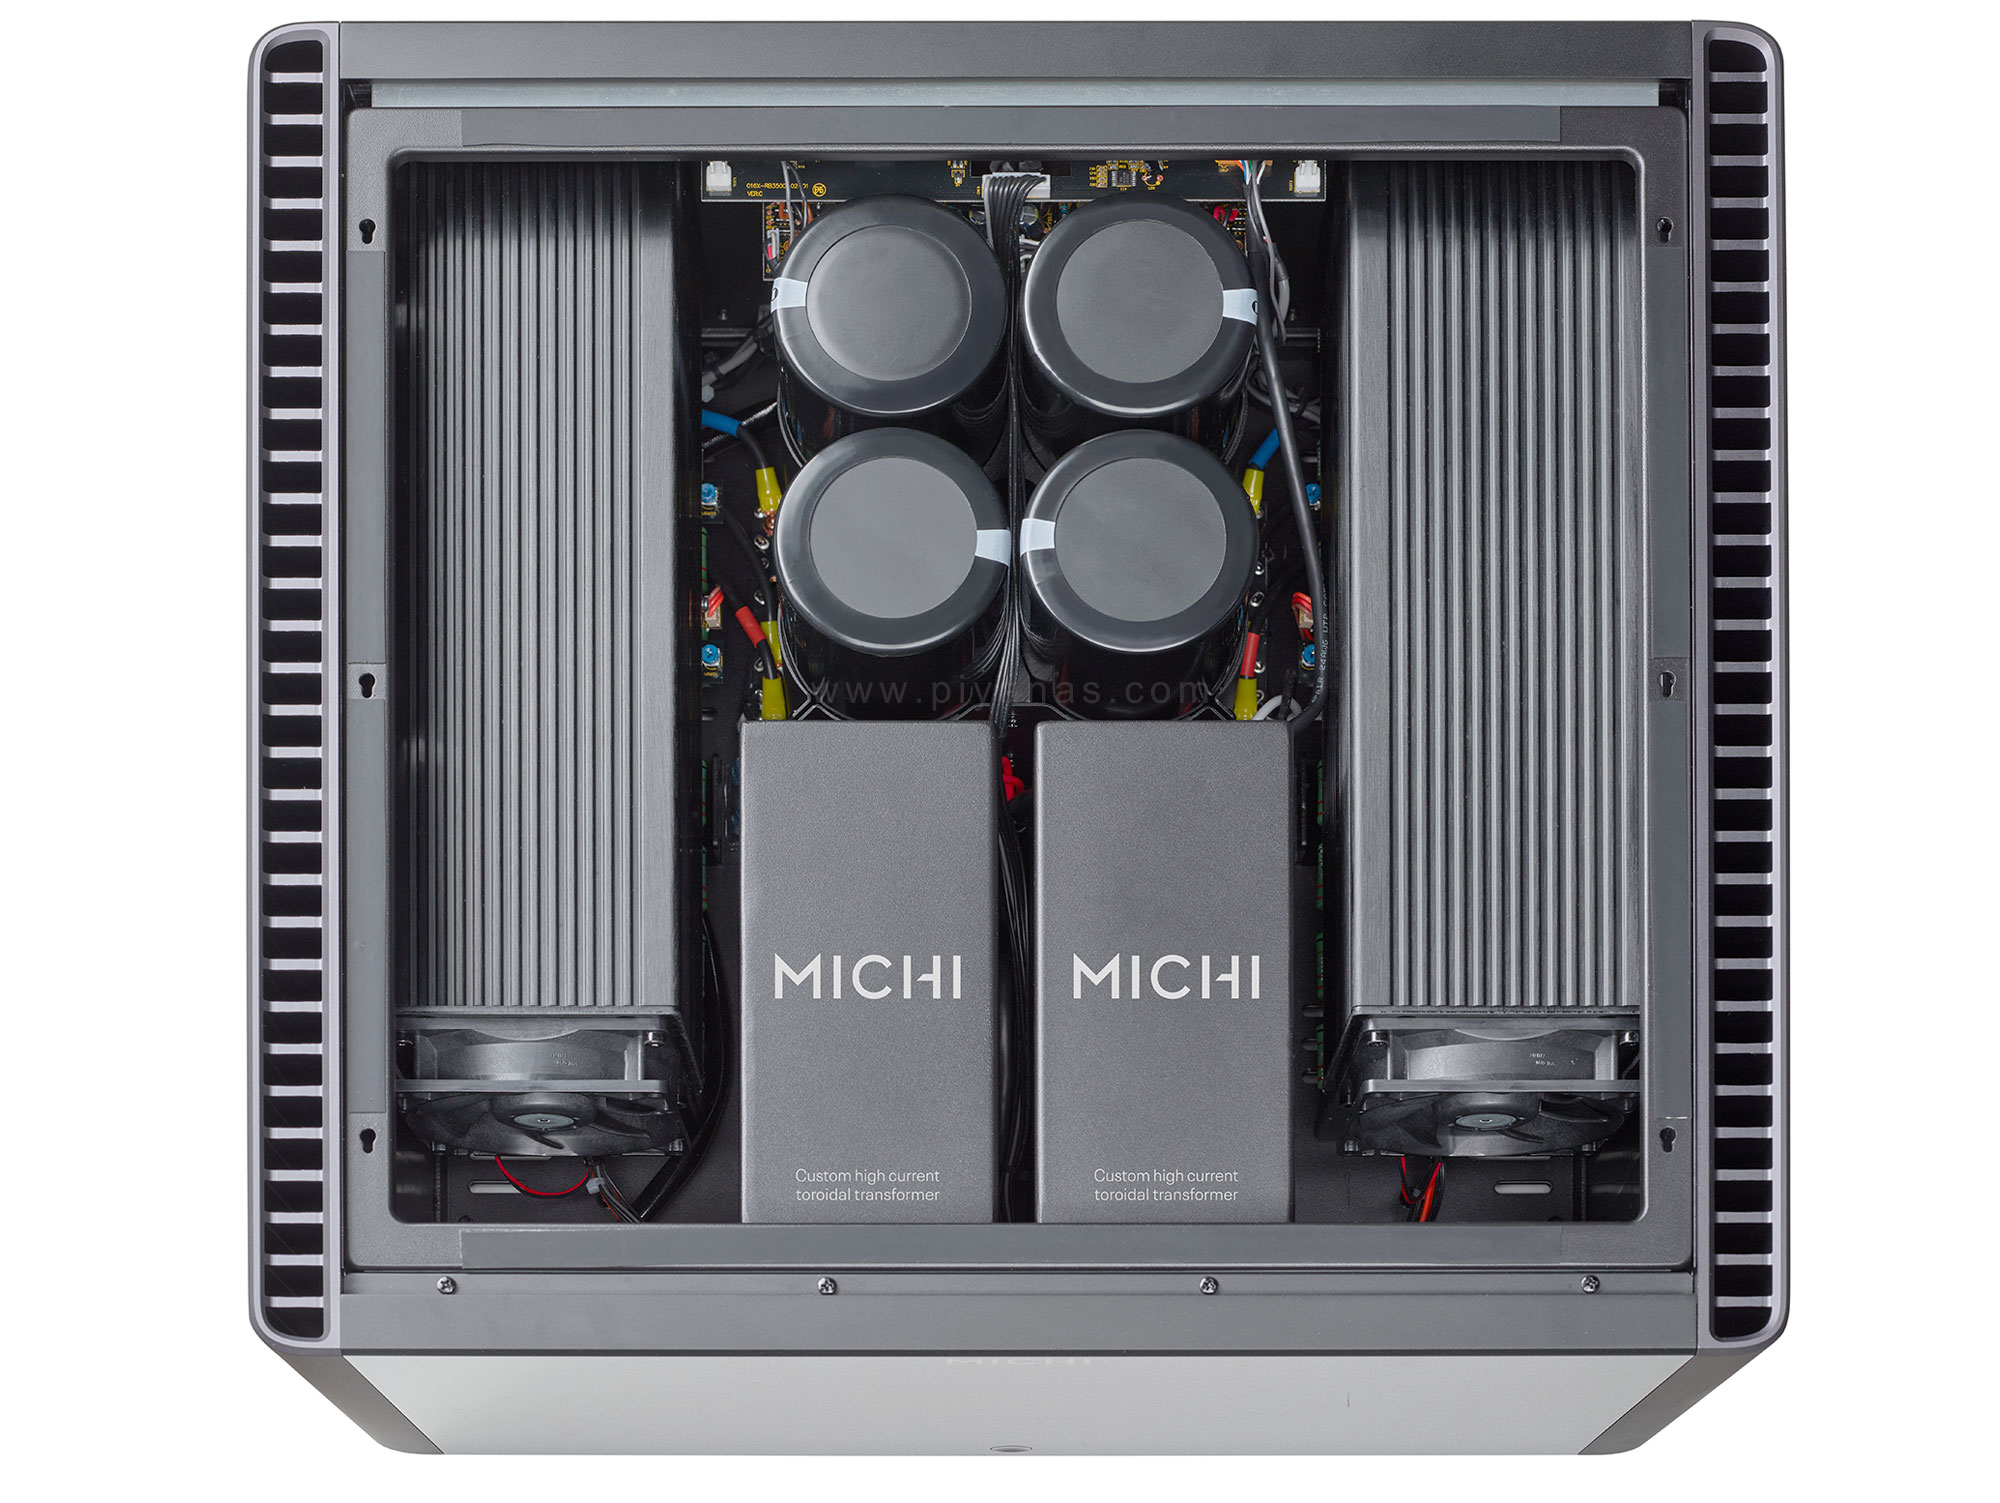 MICHI S5 (Stereo Power Amp)